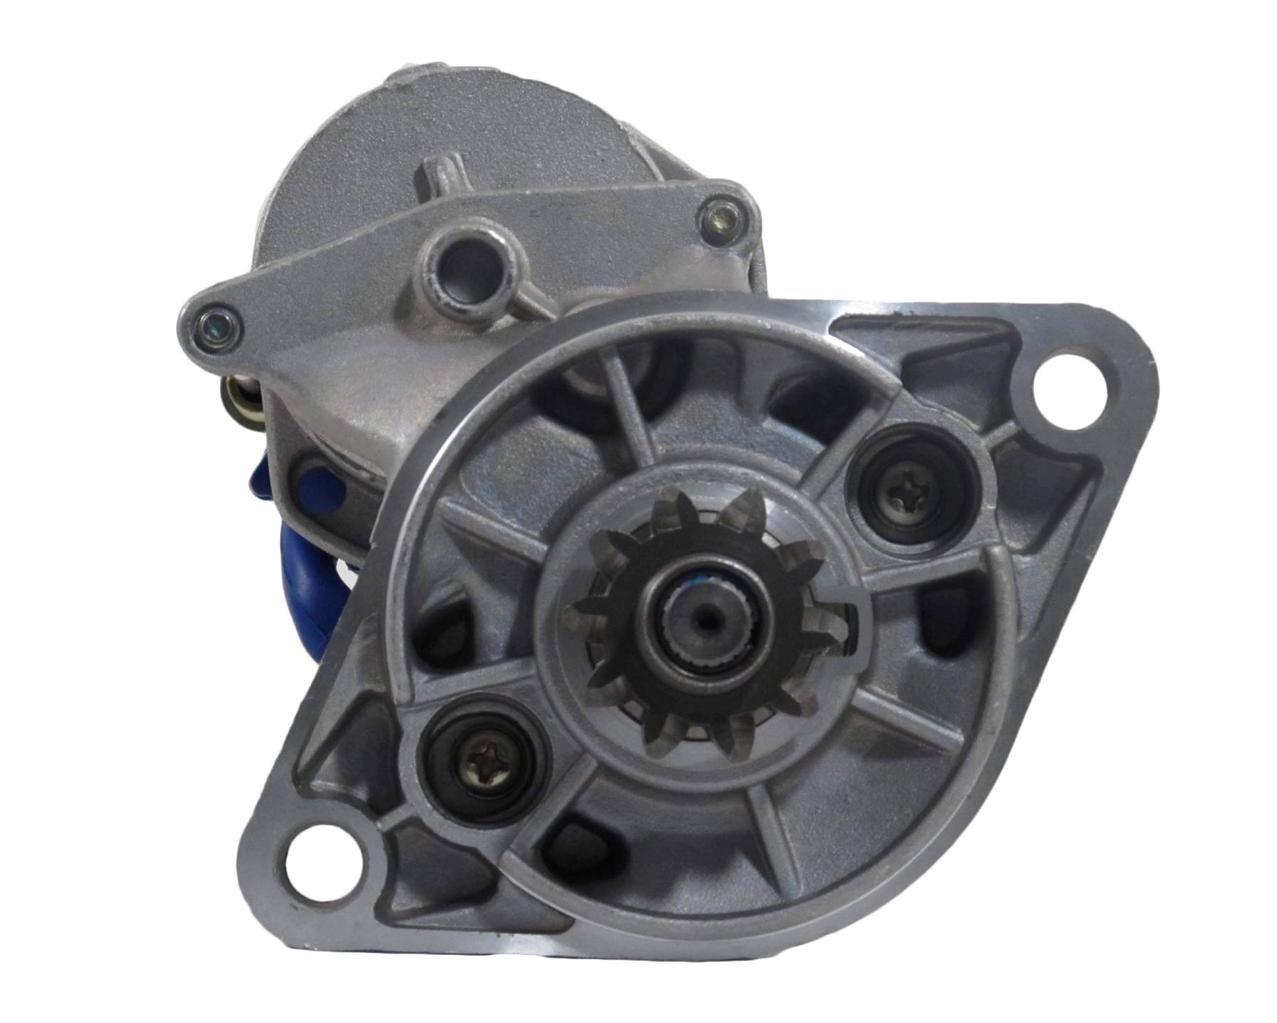 amazon com: gear reduction starter fits jaguar mark series xj6 xk120 xk140  104 tooth fly wheel: automotive